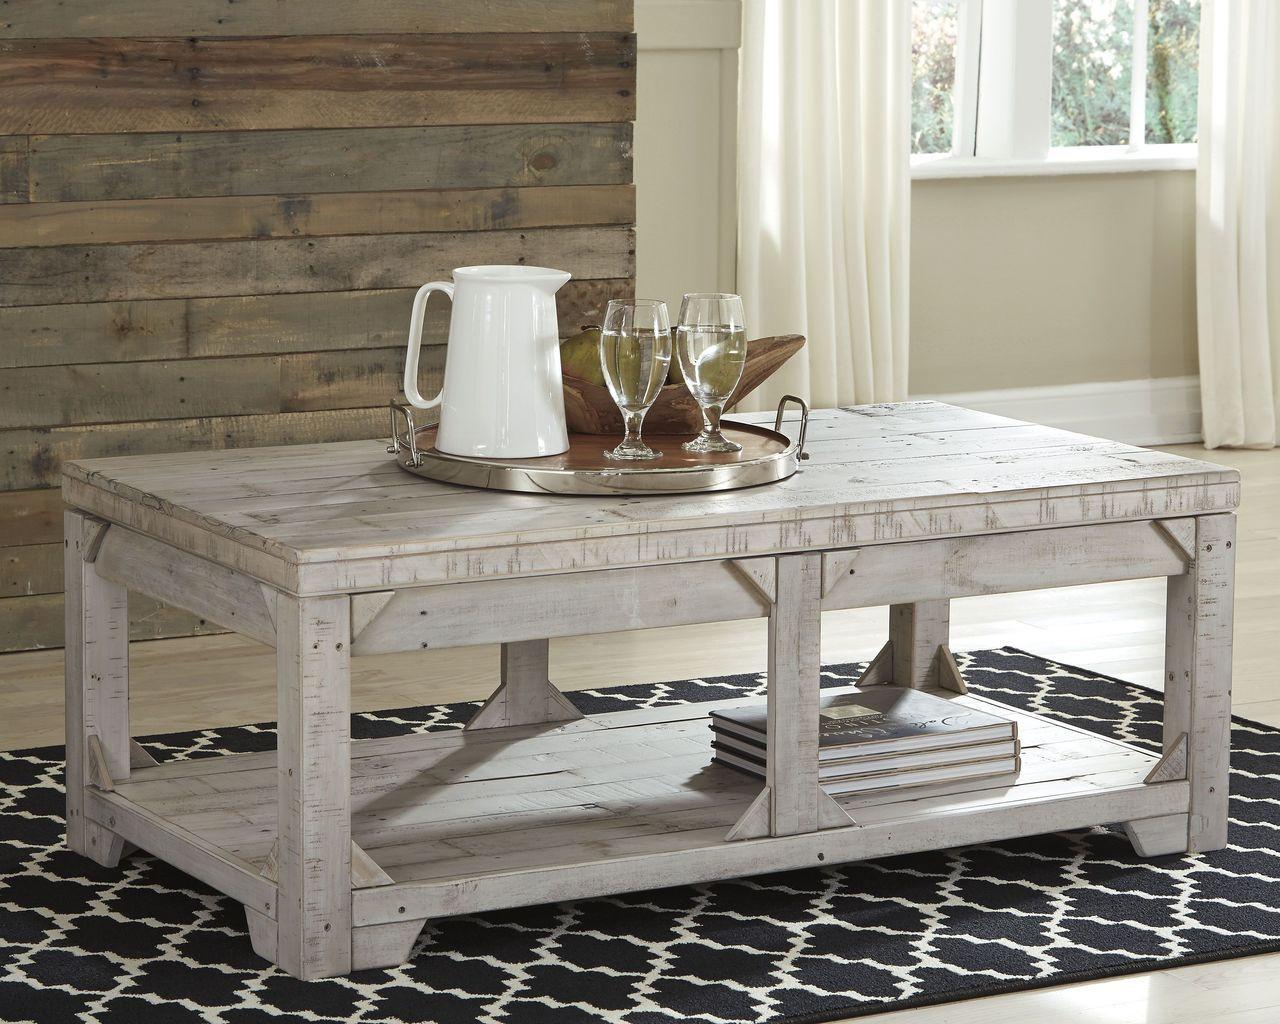 Farmhouse Lift Top Coffee Table.Fregine White Wash Lift Top Cocktail Table